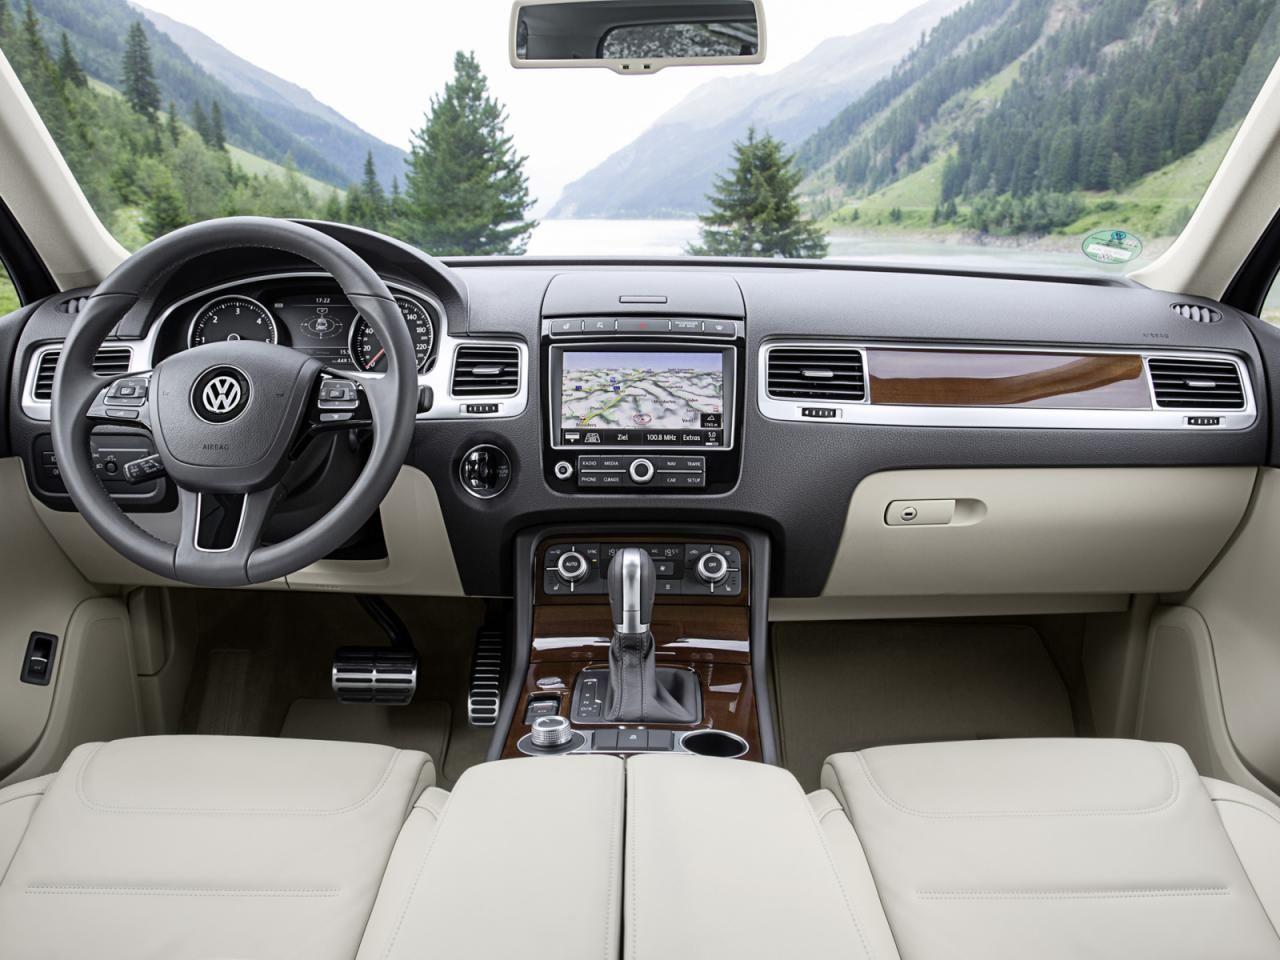 2015-Volkswagen-Touareg-interior.jpg (1280×960) | Juané Car ...